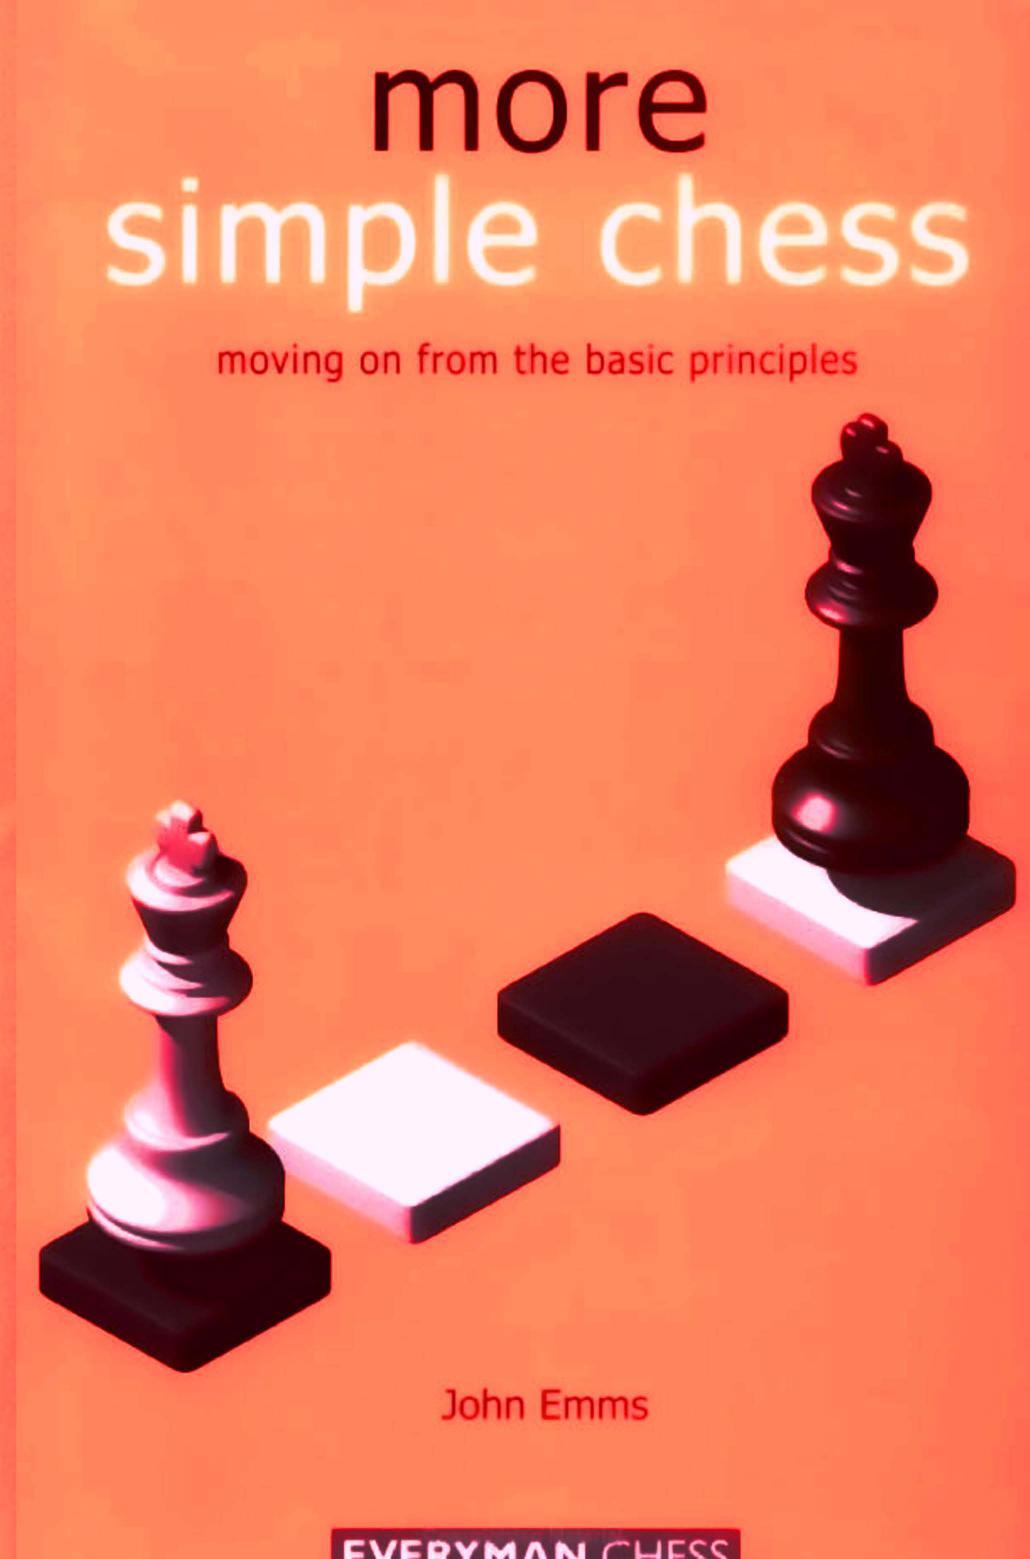 John Emms - More Simple Chess PDF LPpM9cUcZlM